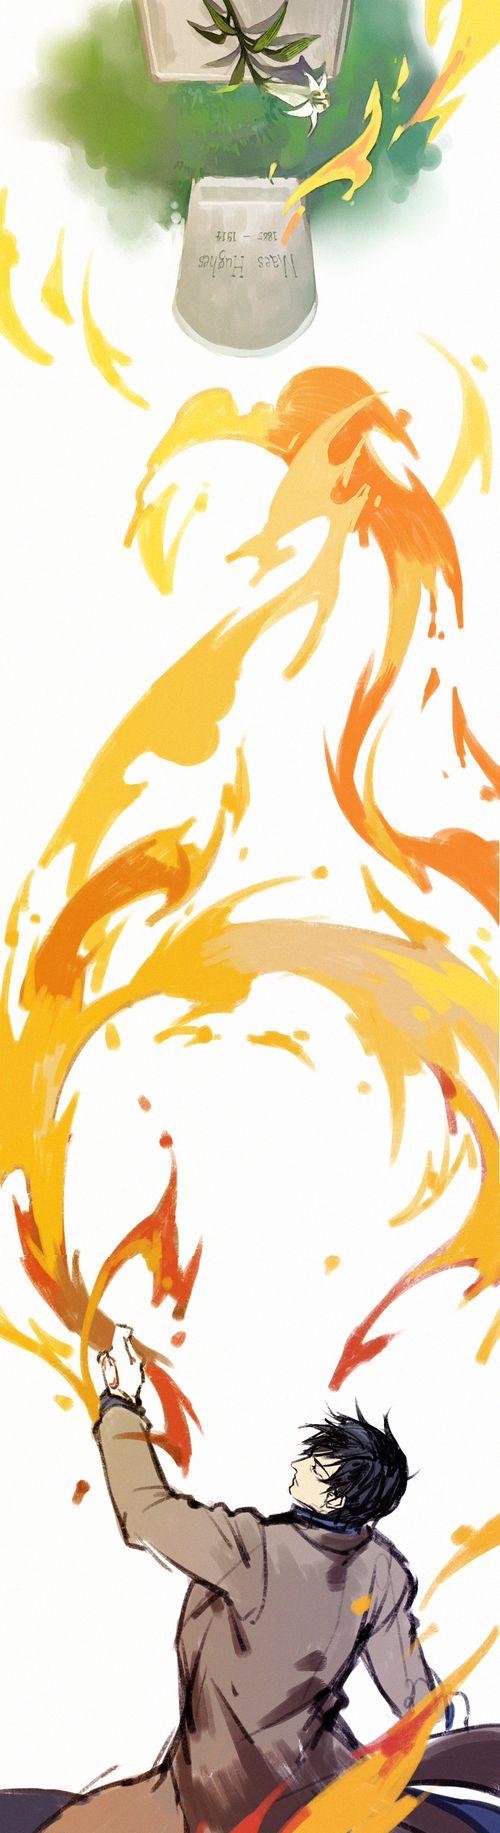 Flame Alchemist by     http://www.pixiv.net/member_illust.php?mode=medium&illust_id=40256849